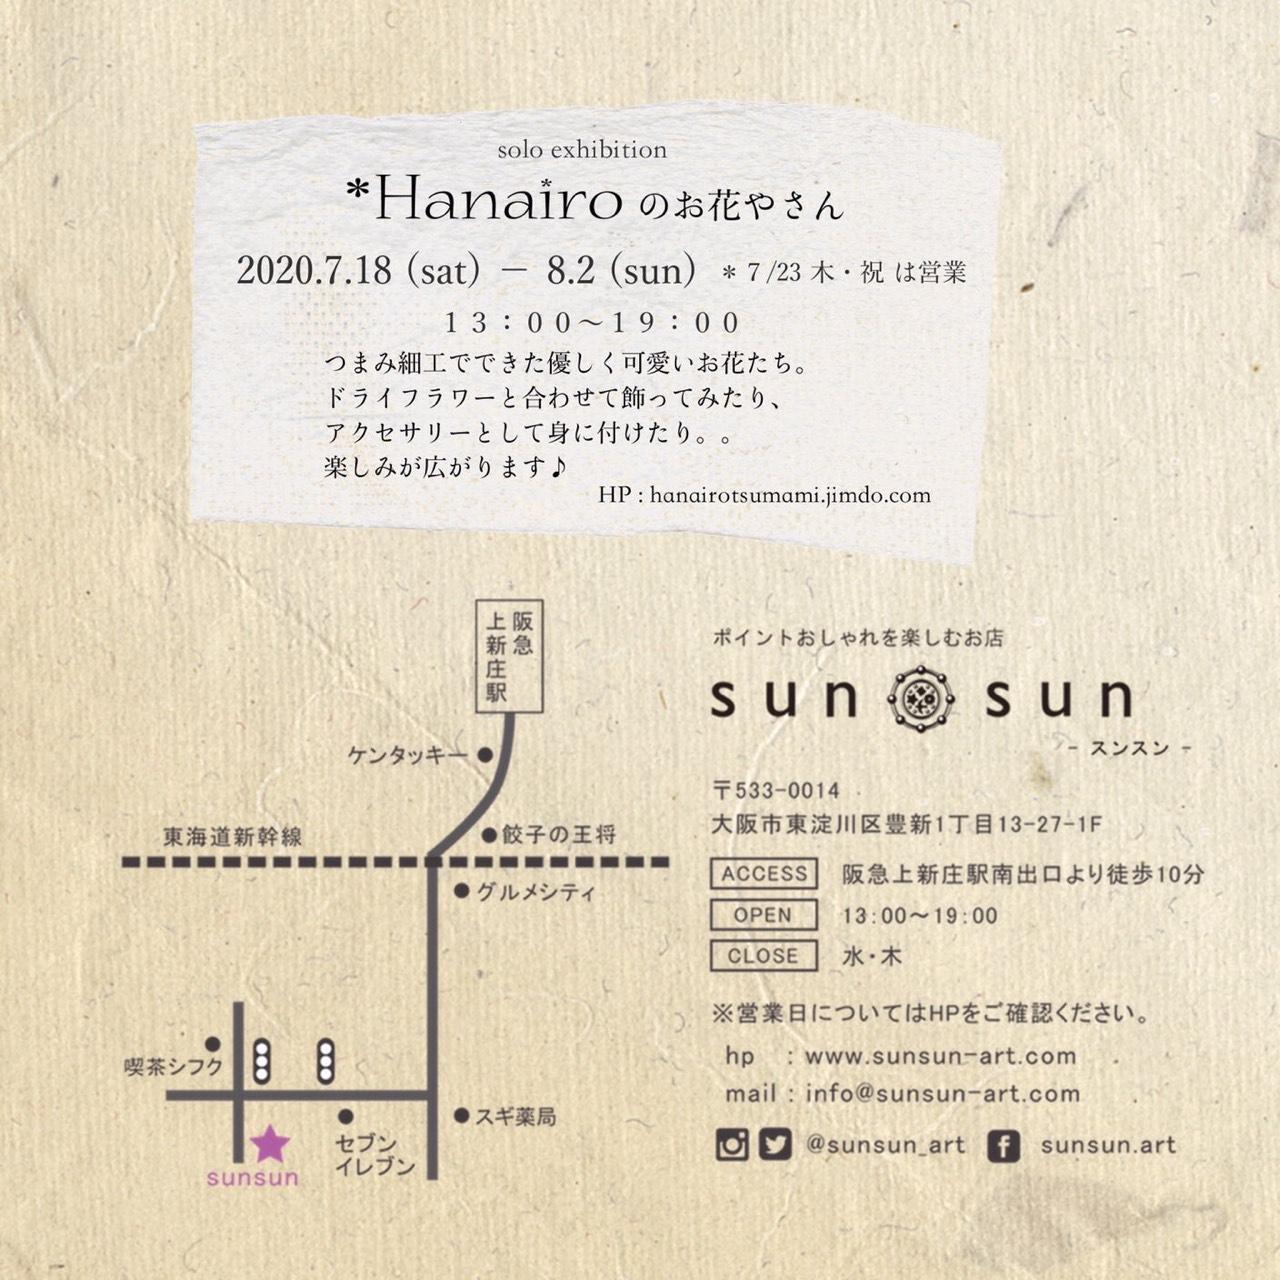 Hanairo 個展「お花やさん」DMのアクセスマップと詳細